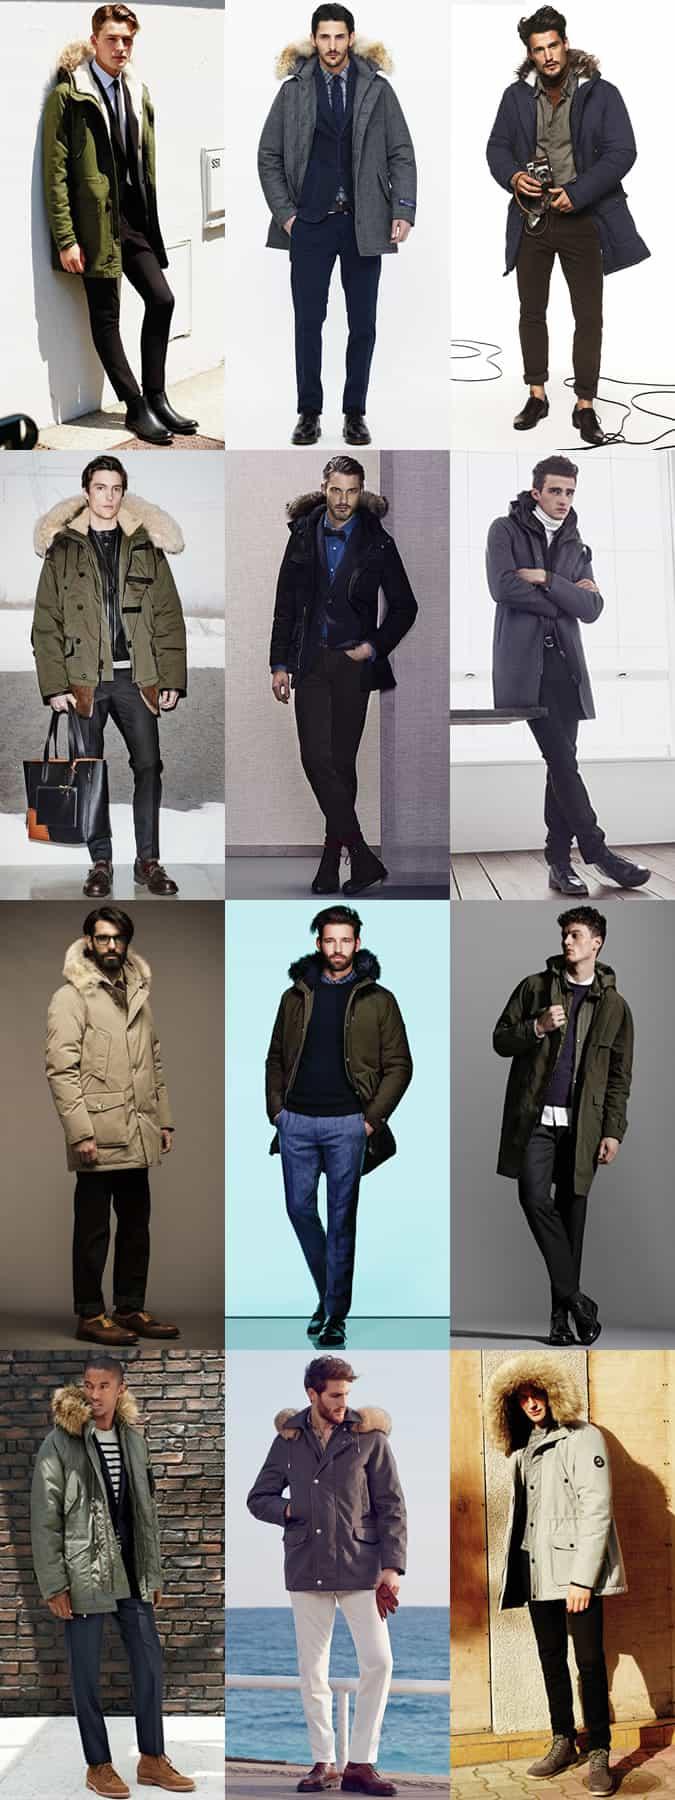 Men's Parka Jackets Outfit Inspiration Lookbook